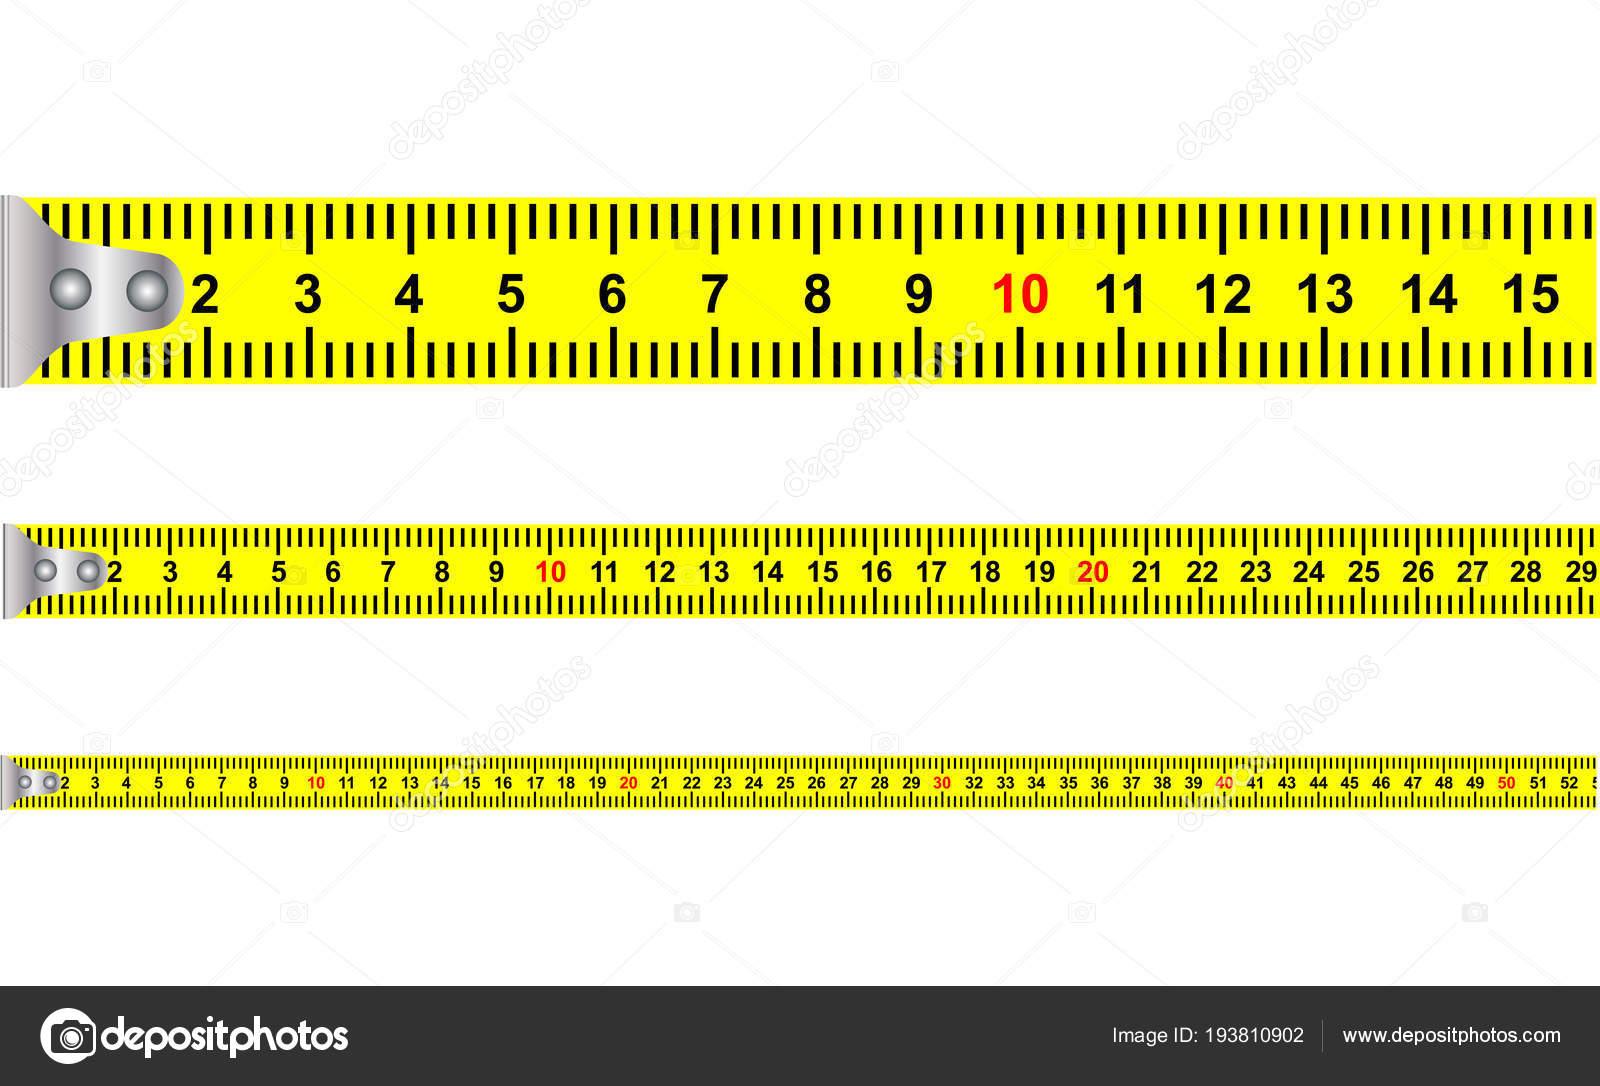 Umrechnung zentimeter in meter